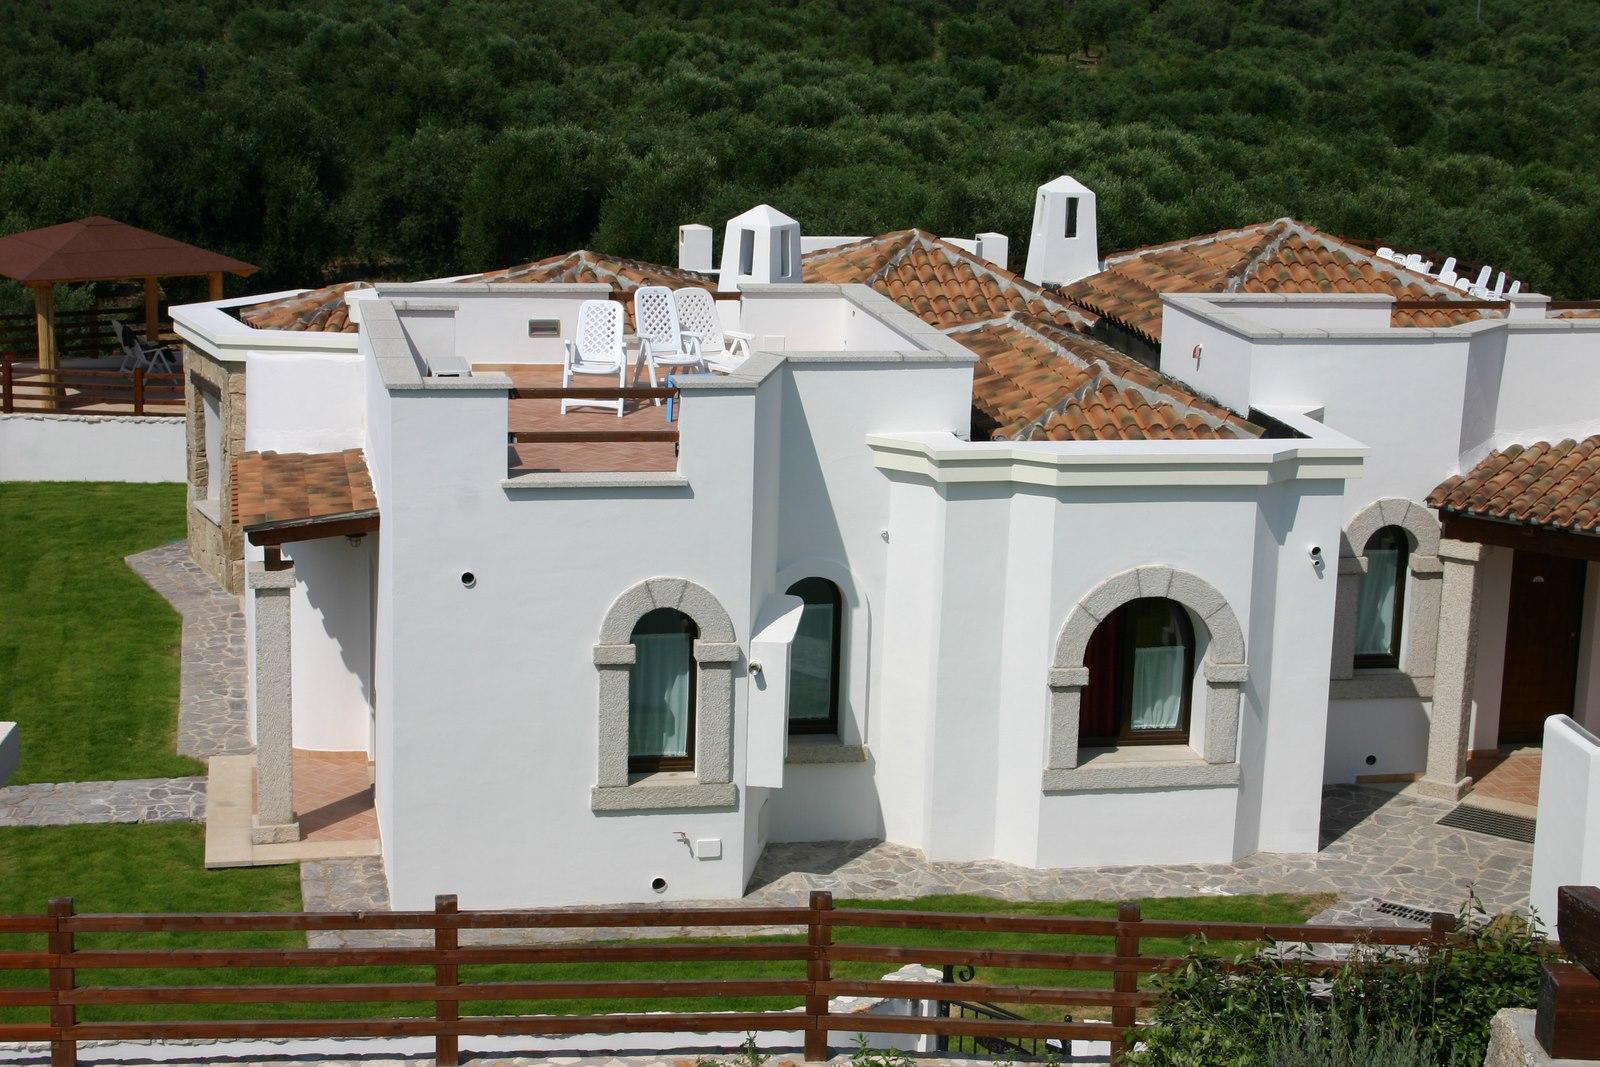 Ferienhaus Carru (877334), Sant Angelo Custode, Sassari, Sardinien, Italien, Bild 14